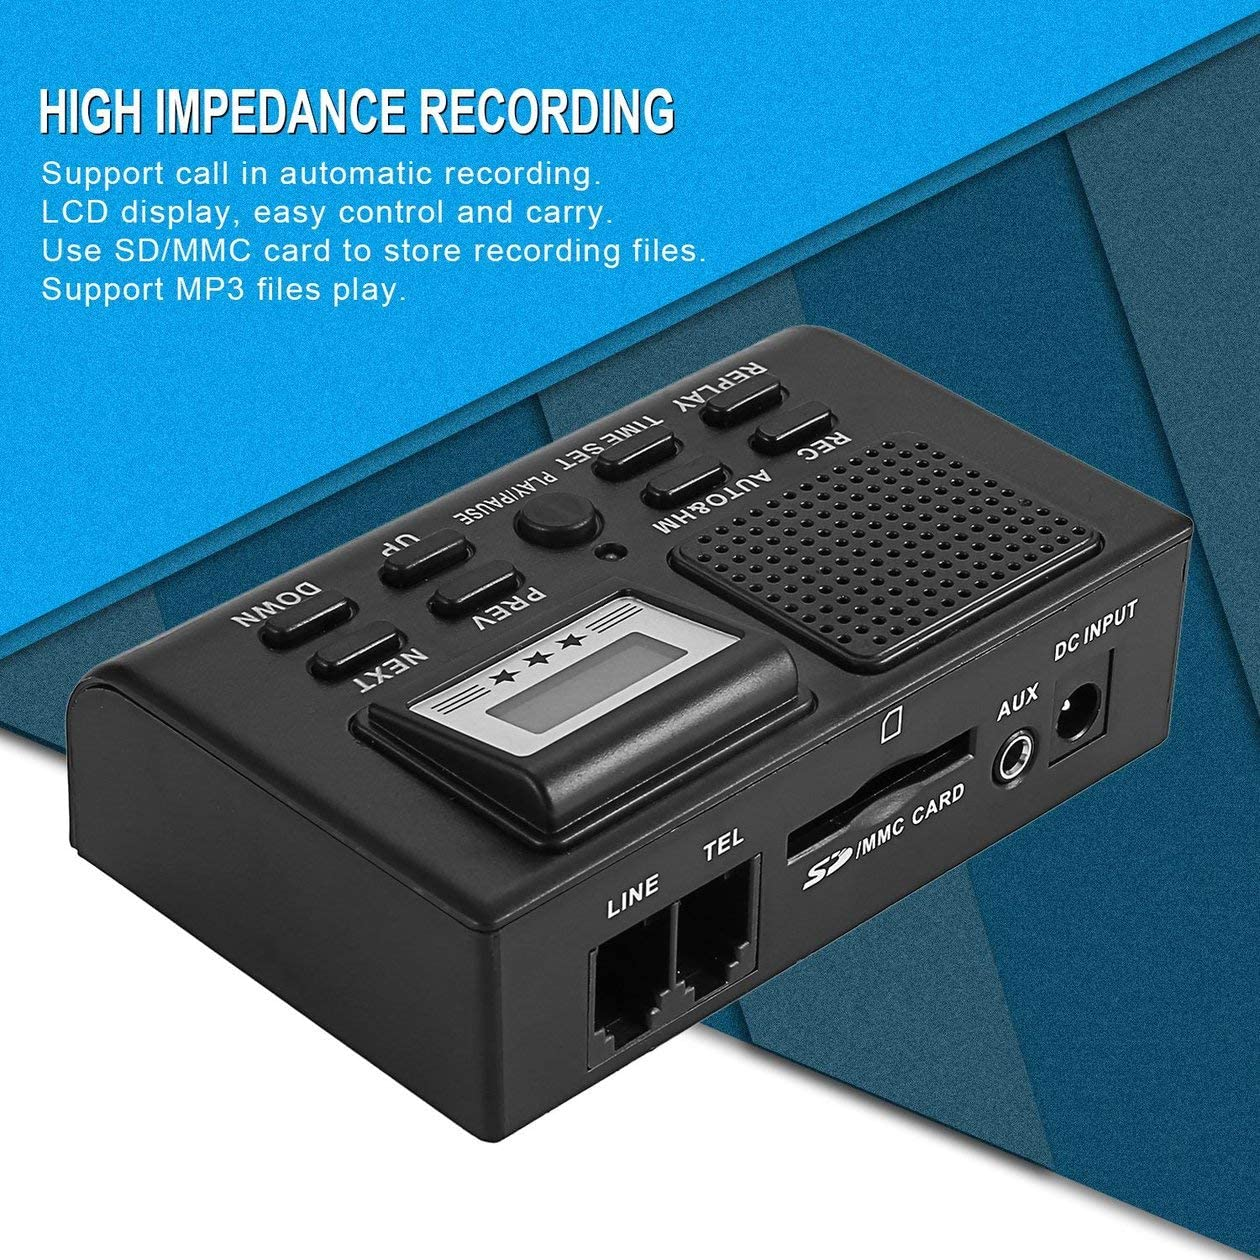 Biyi DSXR Digital-Telefon-Aufnahme-Box LCD Display Support SD-Karte automatische Aufnahme tragbares Mini-Phone Call Recorder schwarz